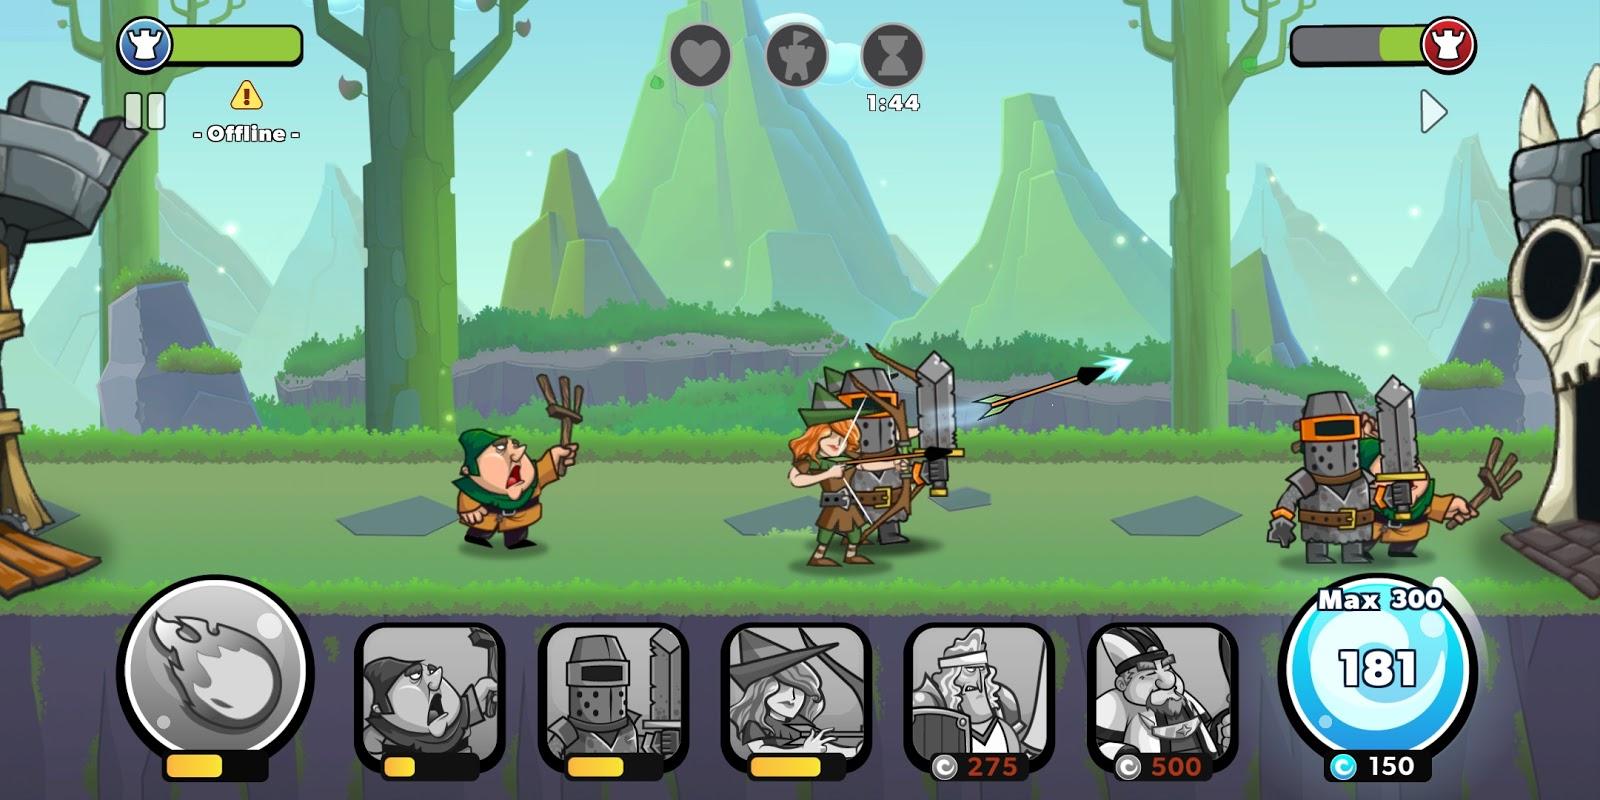 tower conquest mod apk hack download